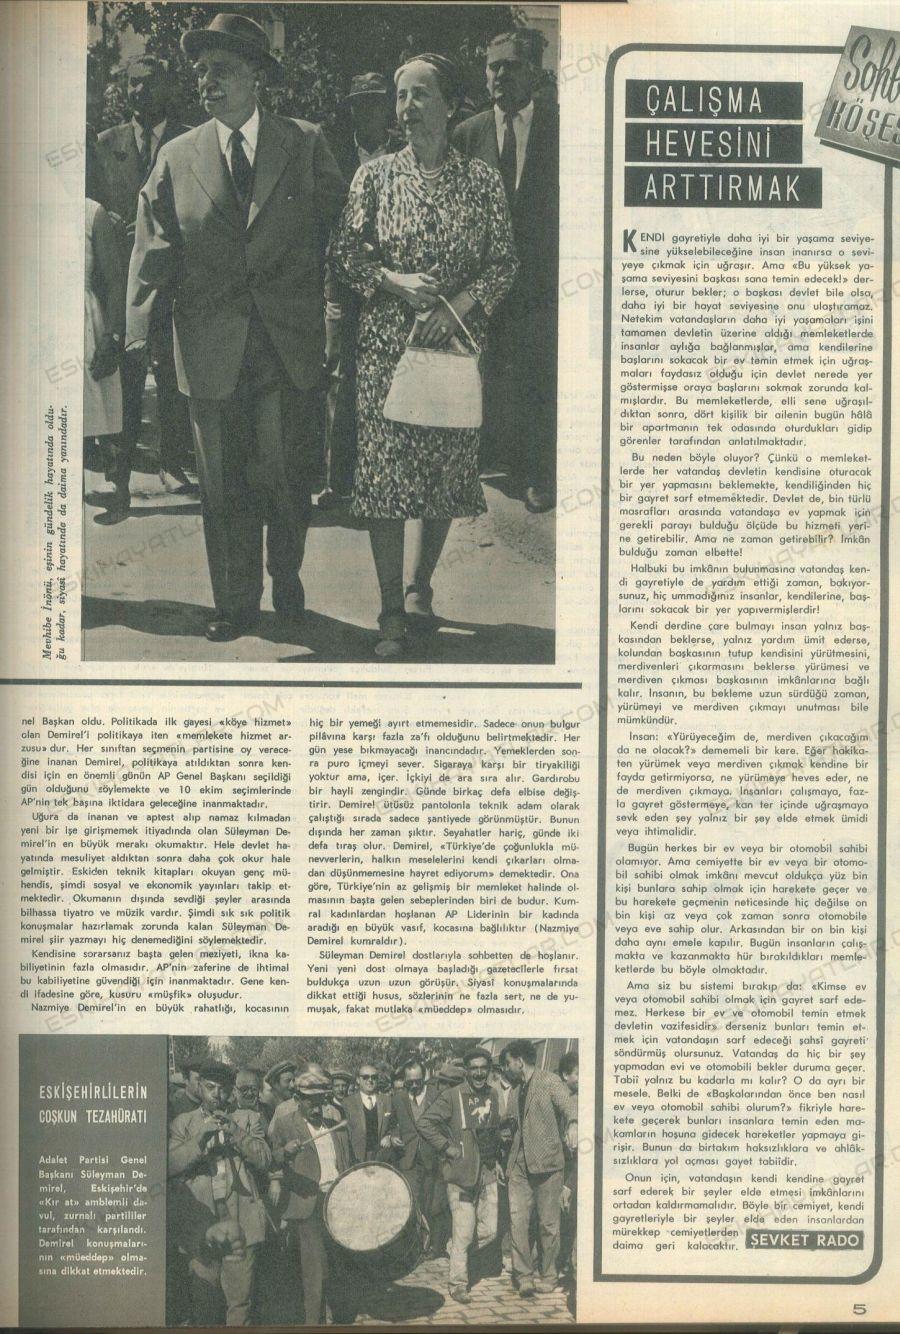 0344-suleyman-demirel-alparslan-turkes-ismet-inonu-1965-yilinda-siyasi-partiler-osman-bolukbasi-ekrem-alican-mehmet-ali-aybar (3)